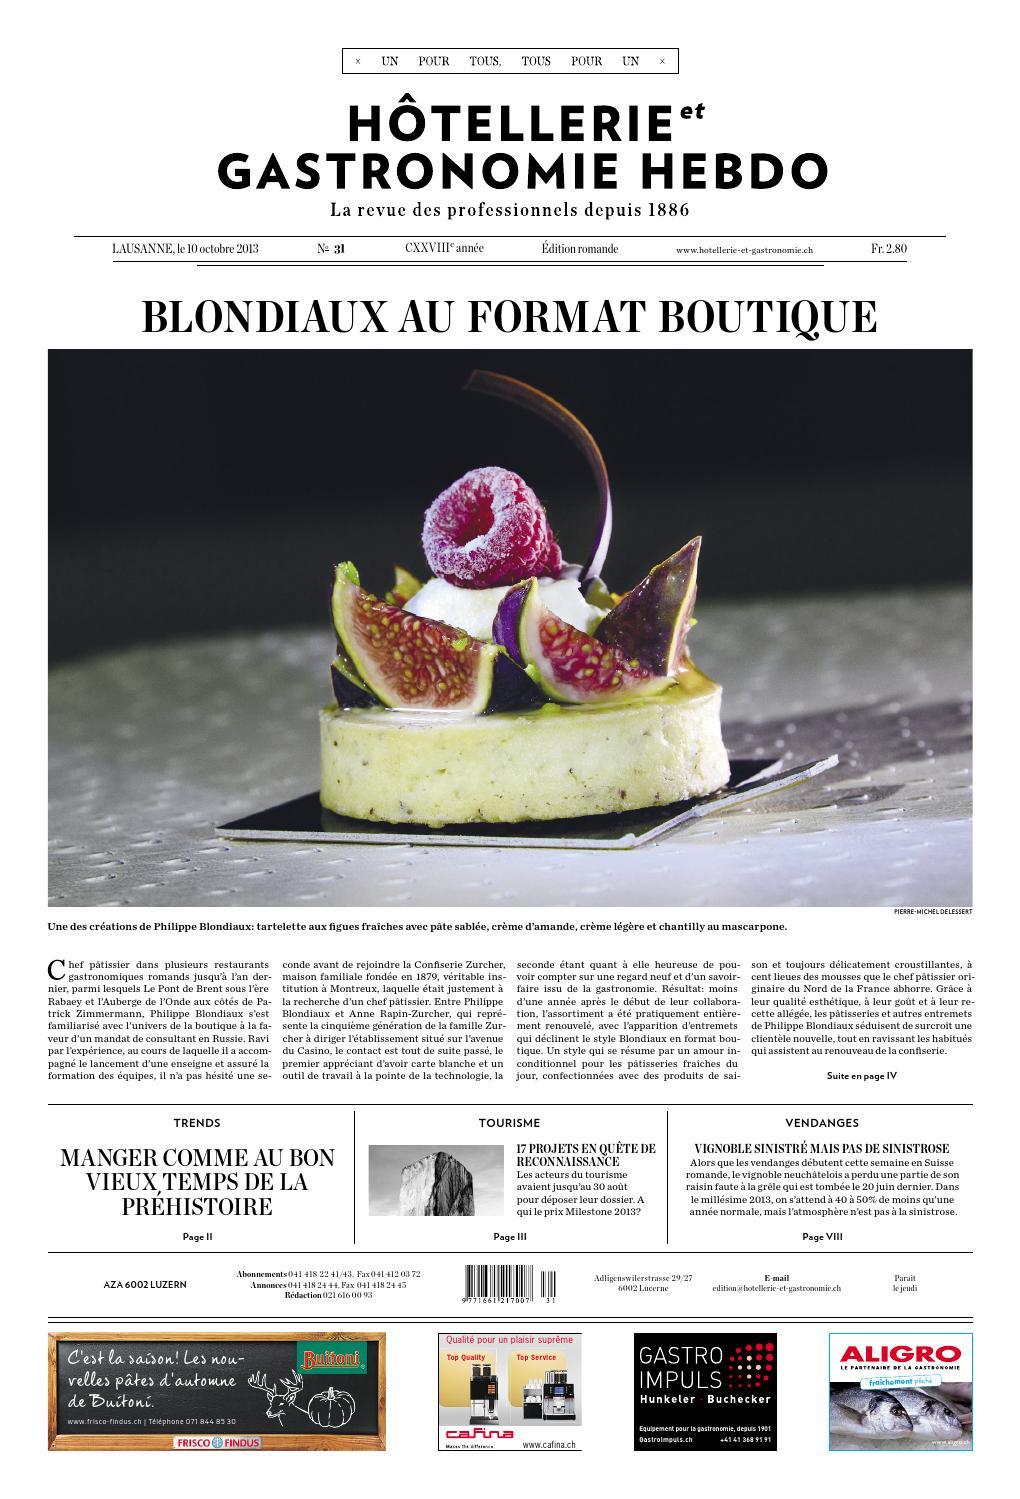 HetG Hebdo 31 2013 By Hotellerie Gastronomie Verlag